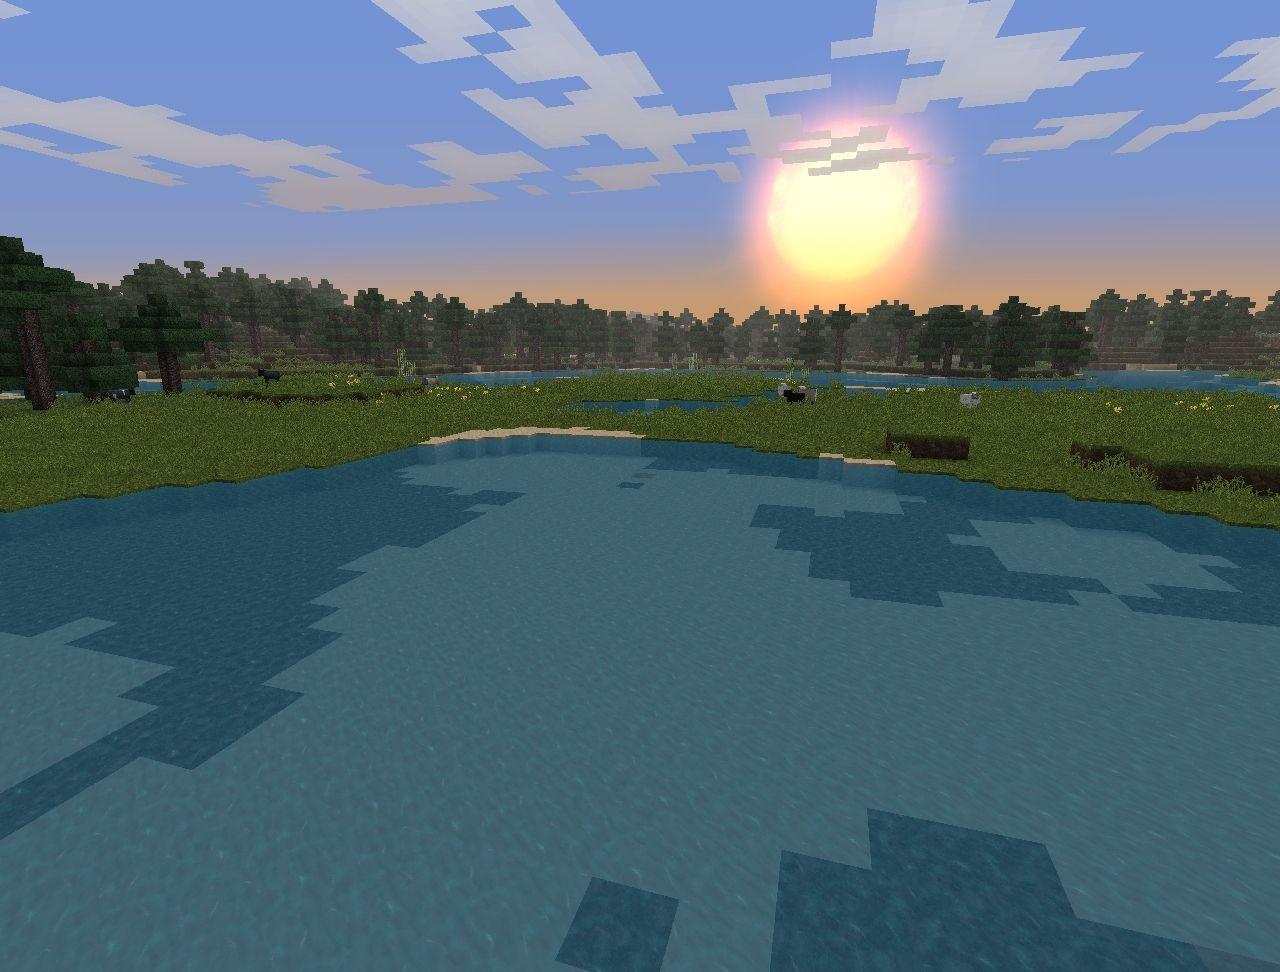 More Almost flatlands